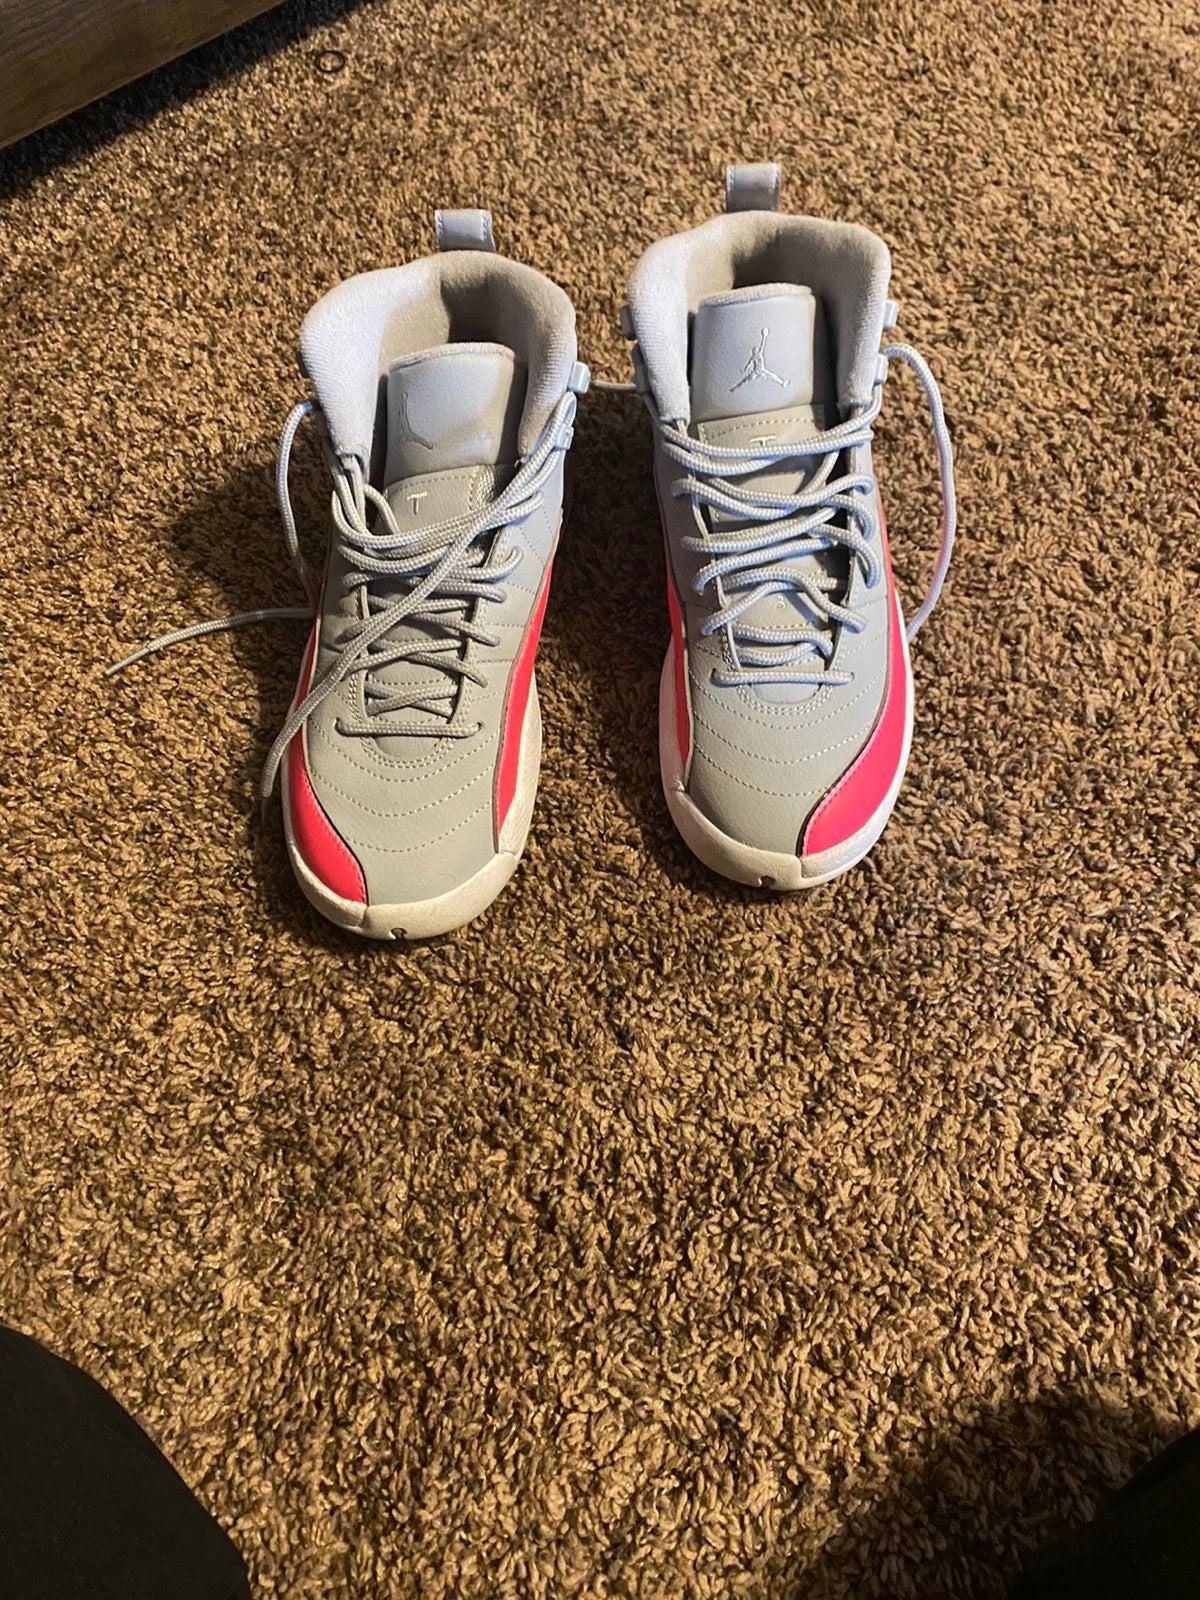 Jordans gray and hot pink